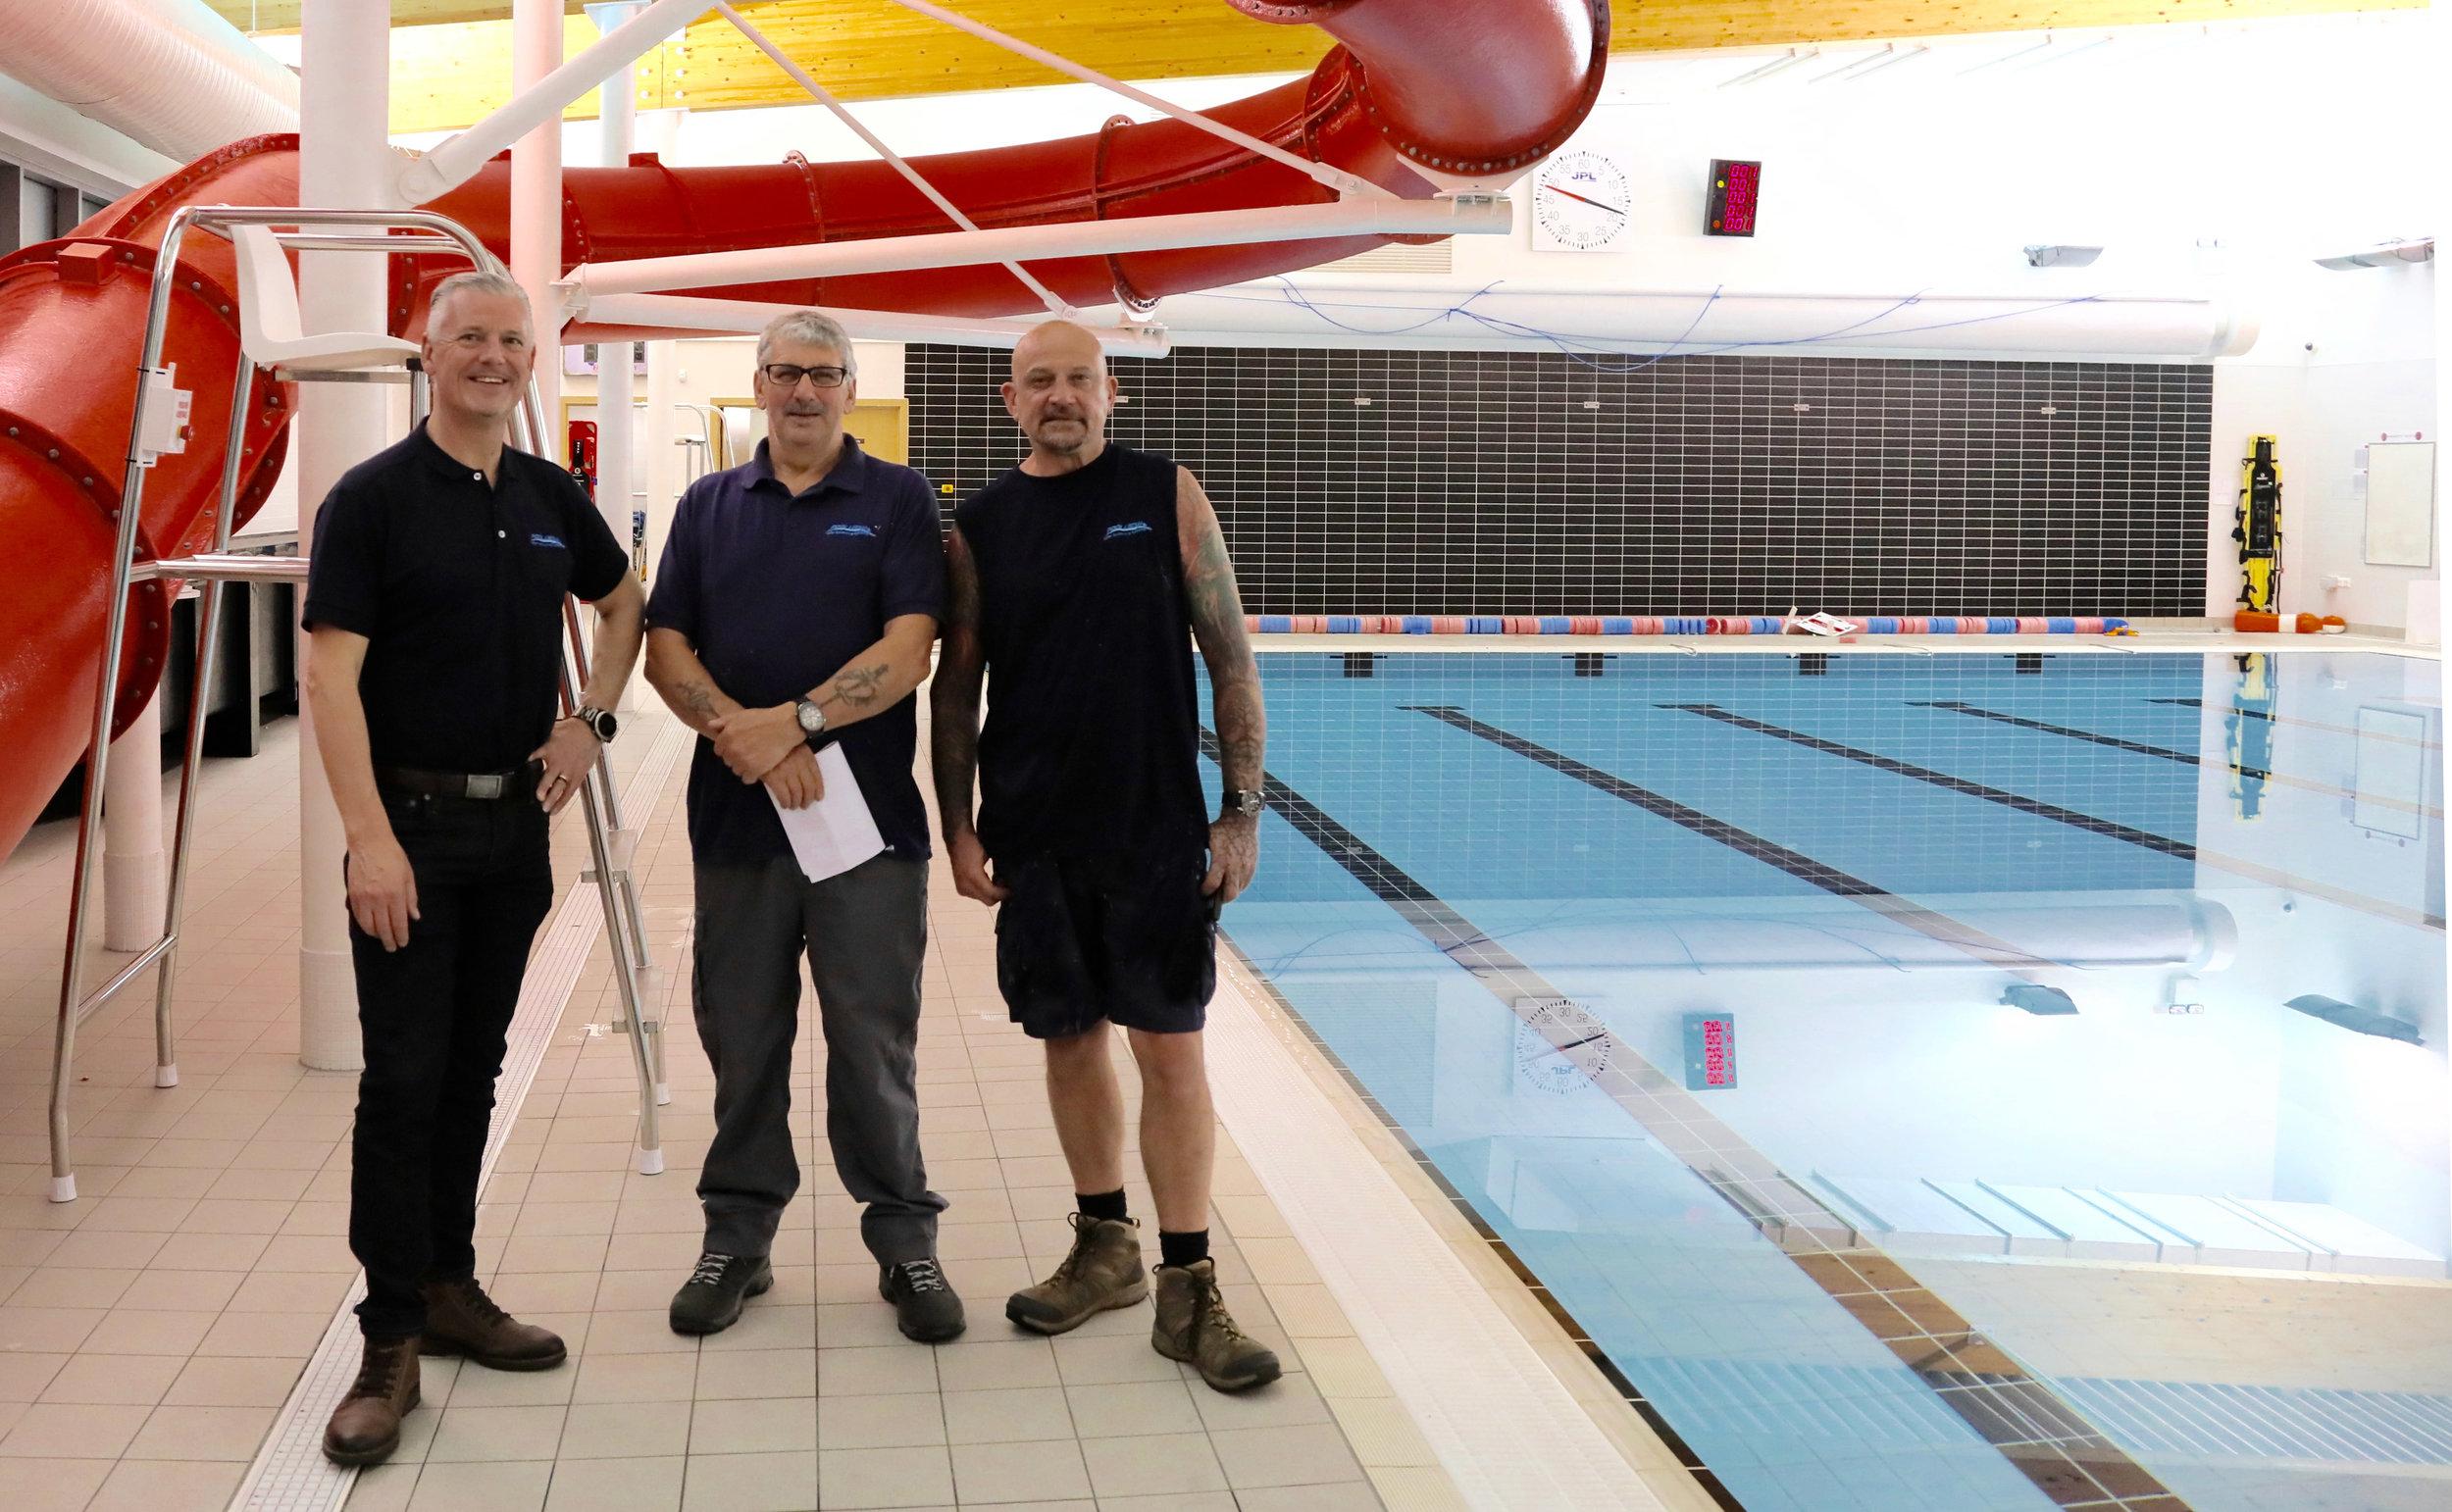 Robin McGloughlin, Andrew English and Wally Wallis